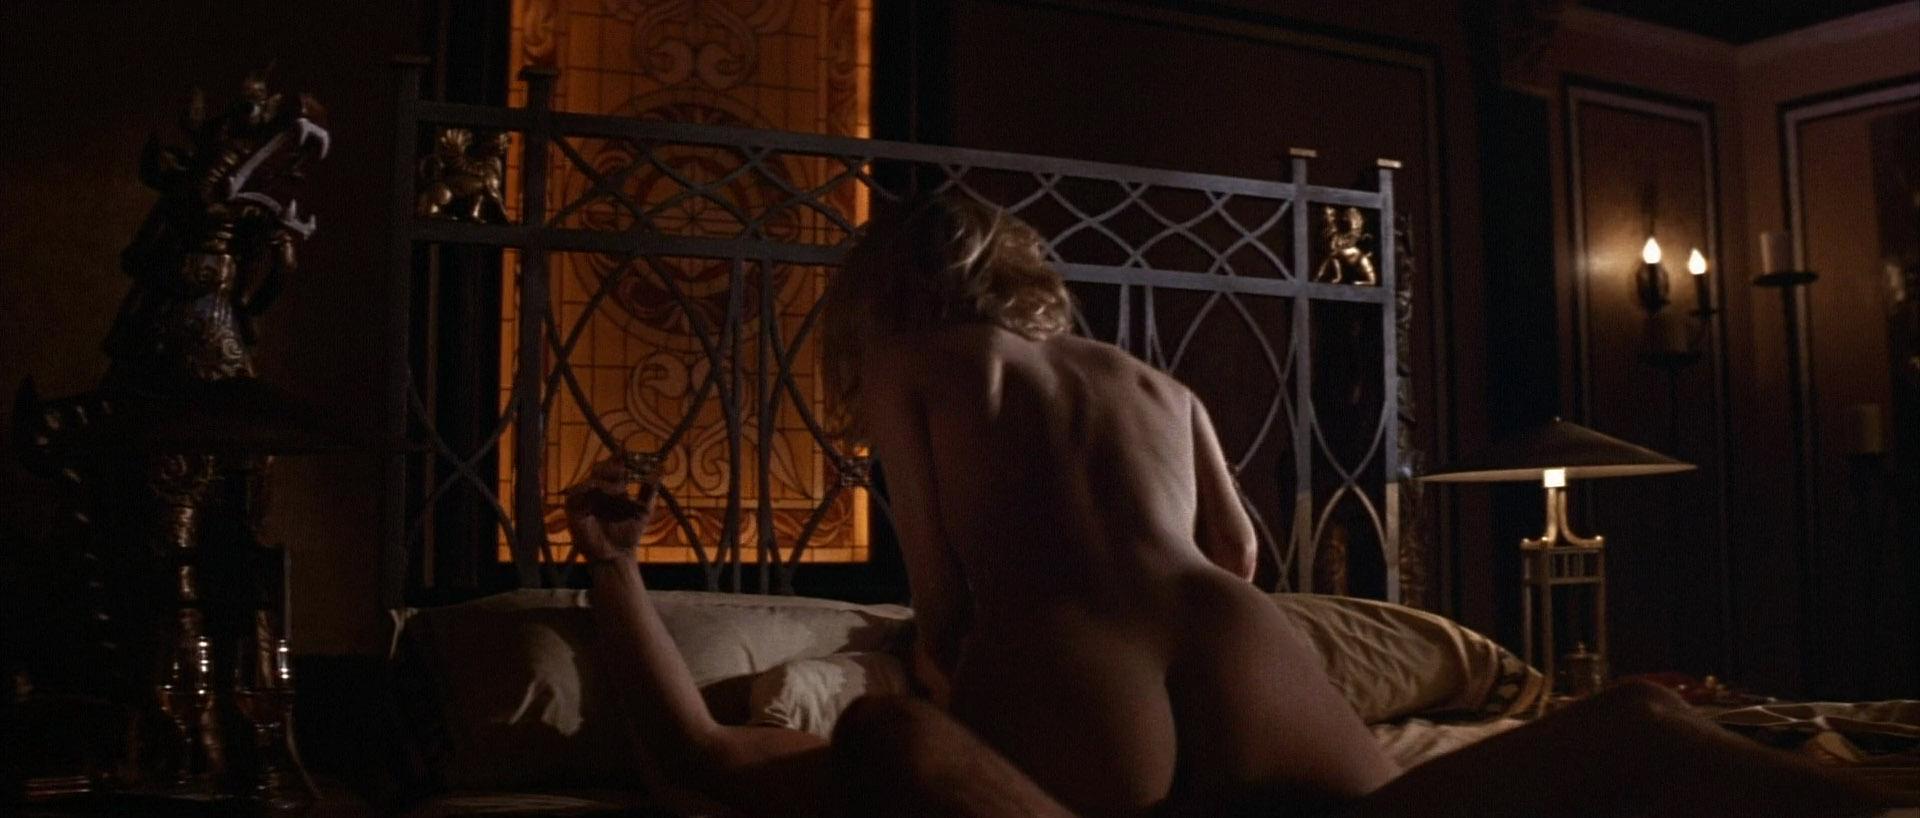 Лента порно HD онлайн  смотреть Гиг порно видео секс и